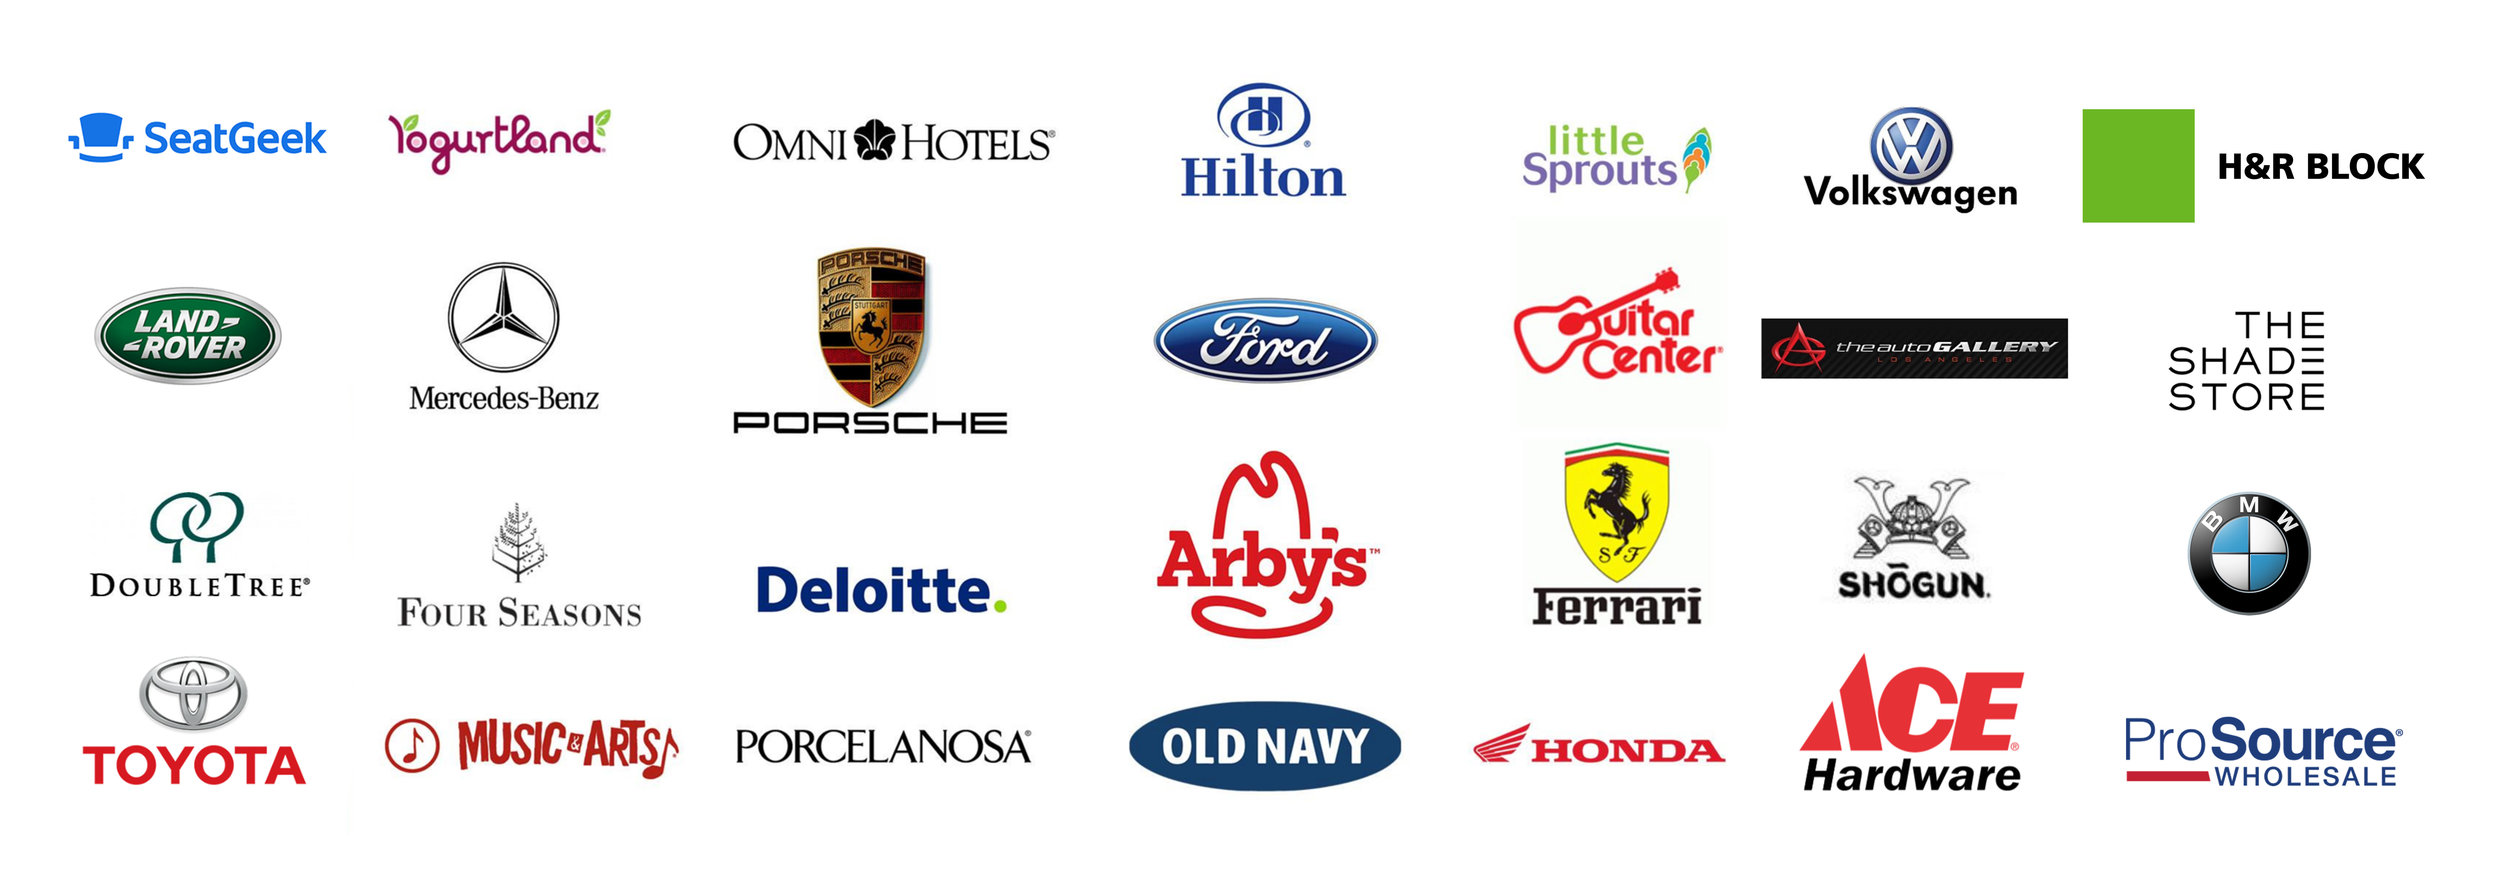 client logos 2.20.19.jpg